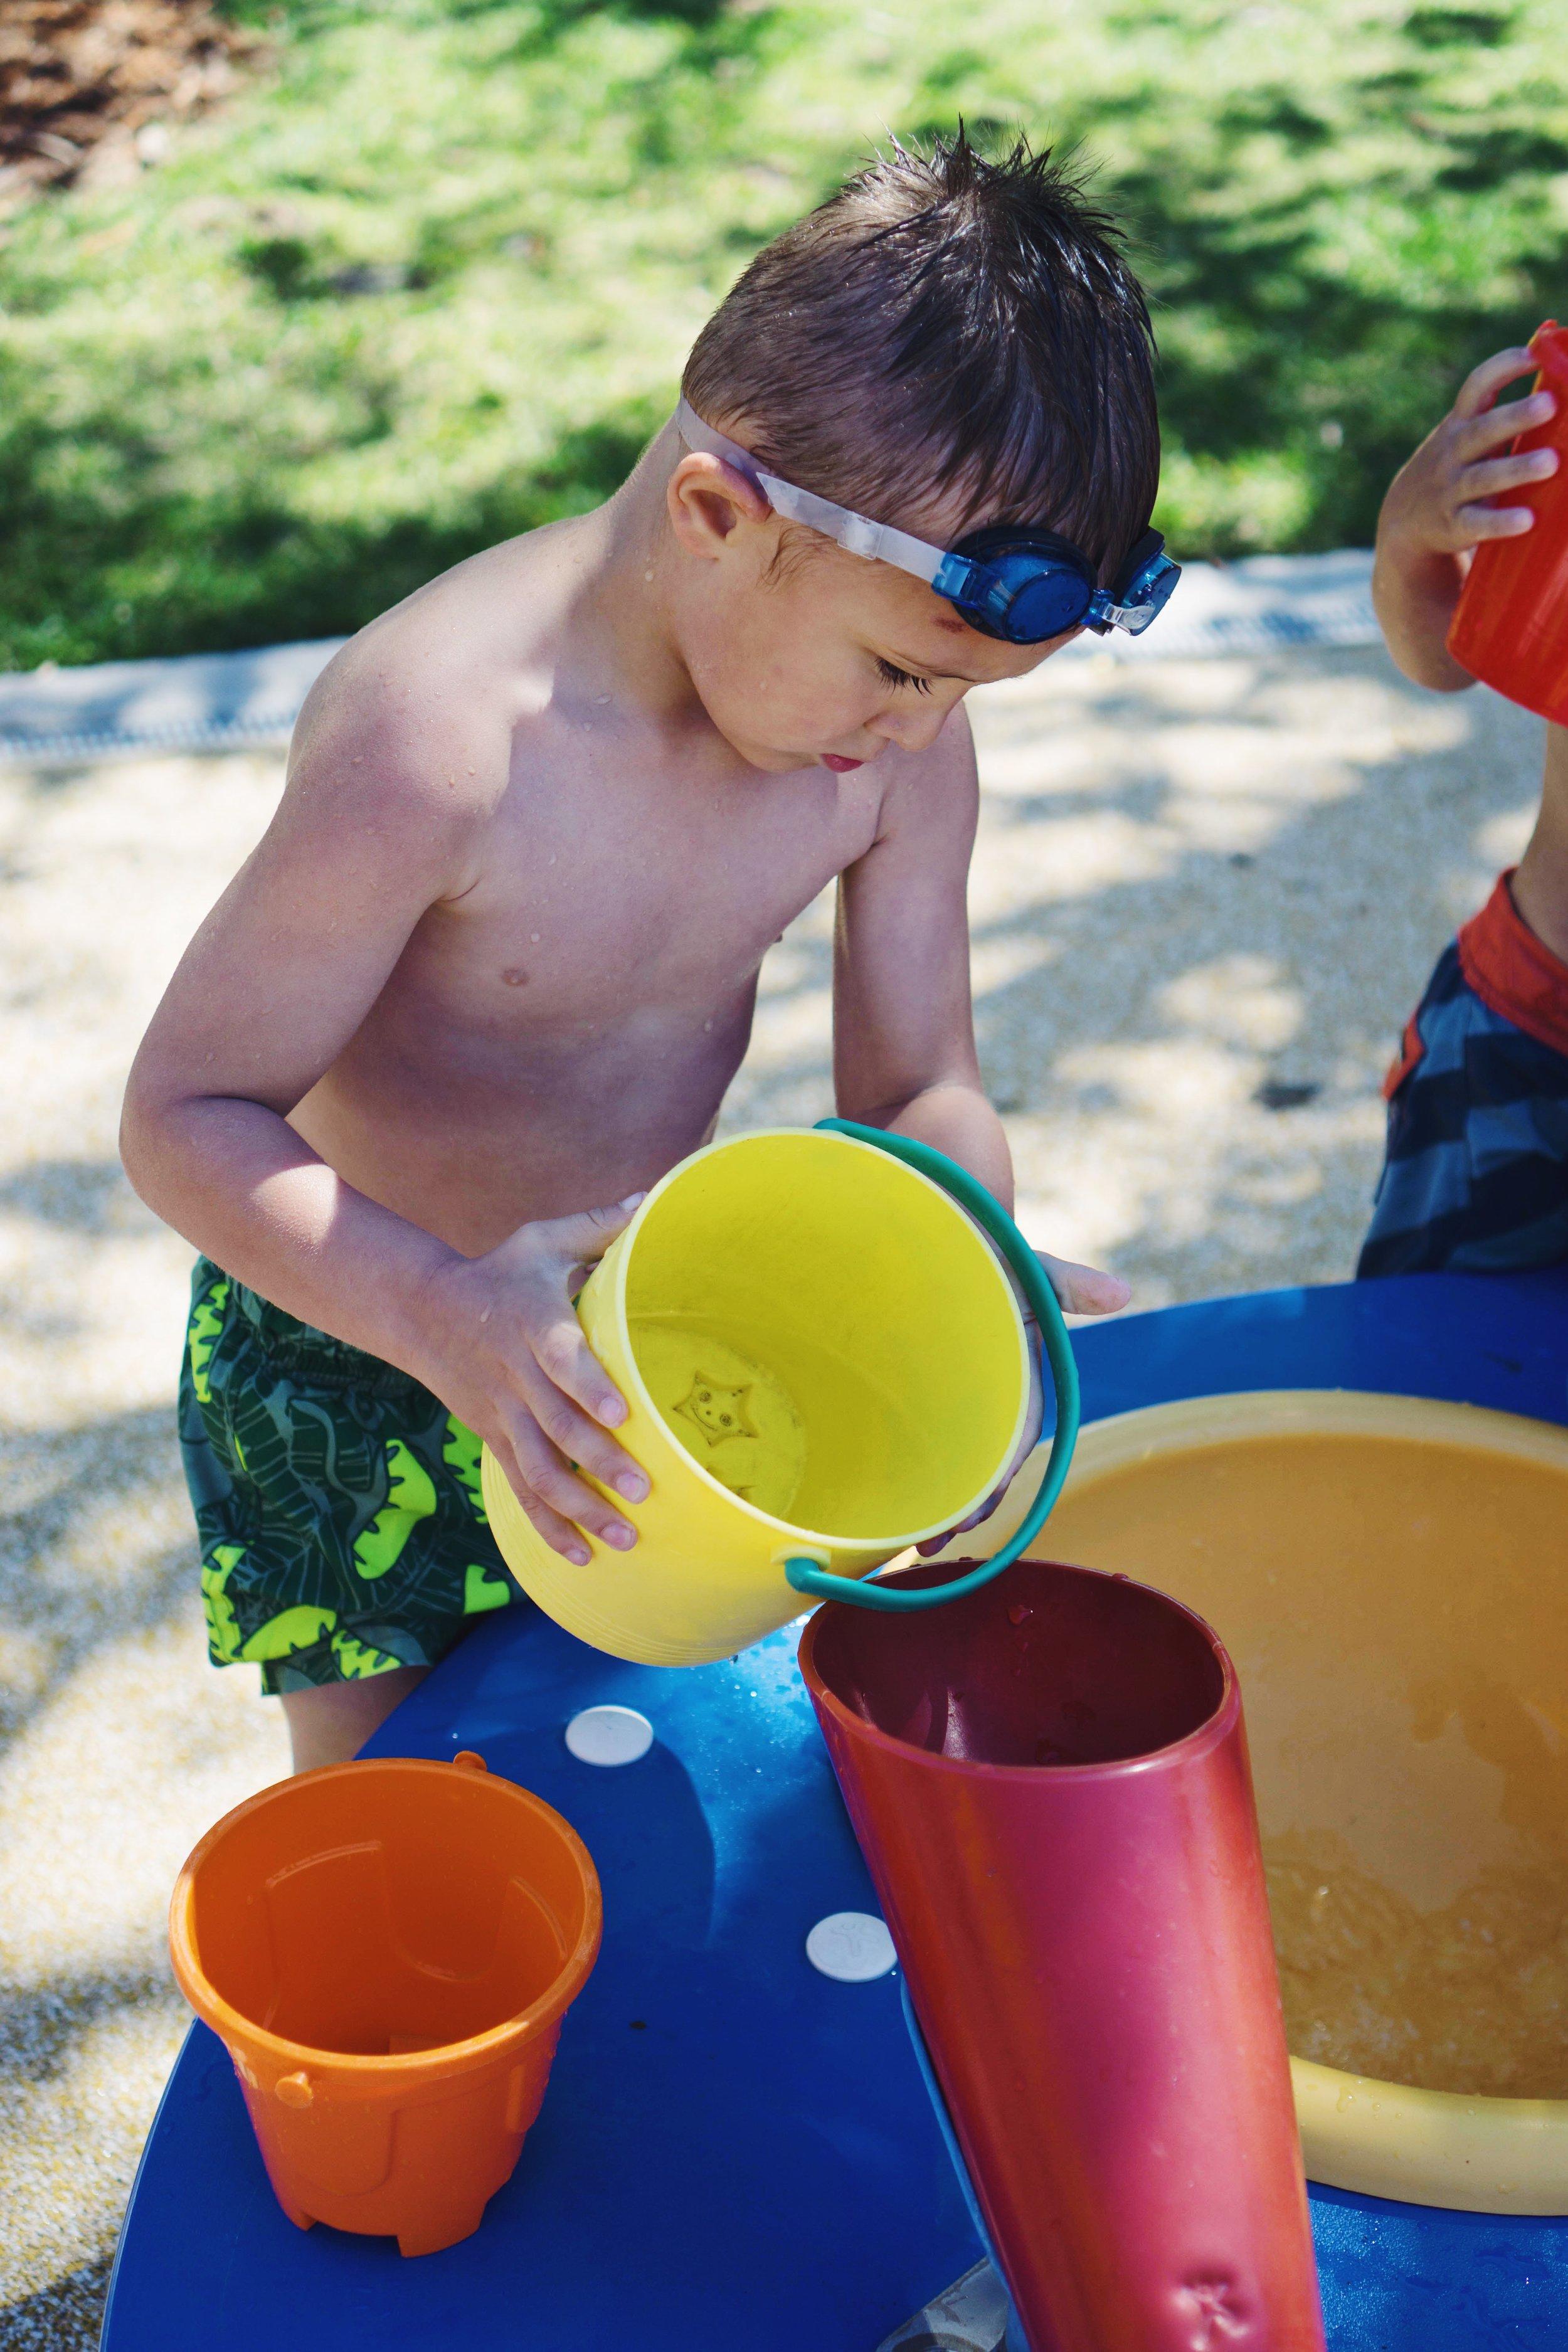 "<img src =""family-friendly-fun-in-denver-colorado.jpg"" alt =""fashion-bloggers-son-plays-at-a-local-pool-in-denver-colorado-sharing-family-friendly-fun-in-denver"">"